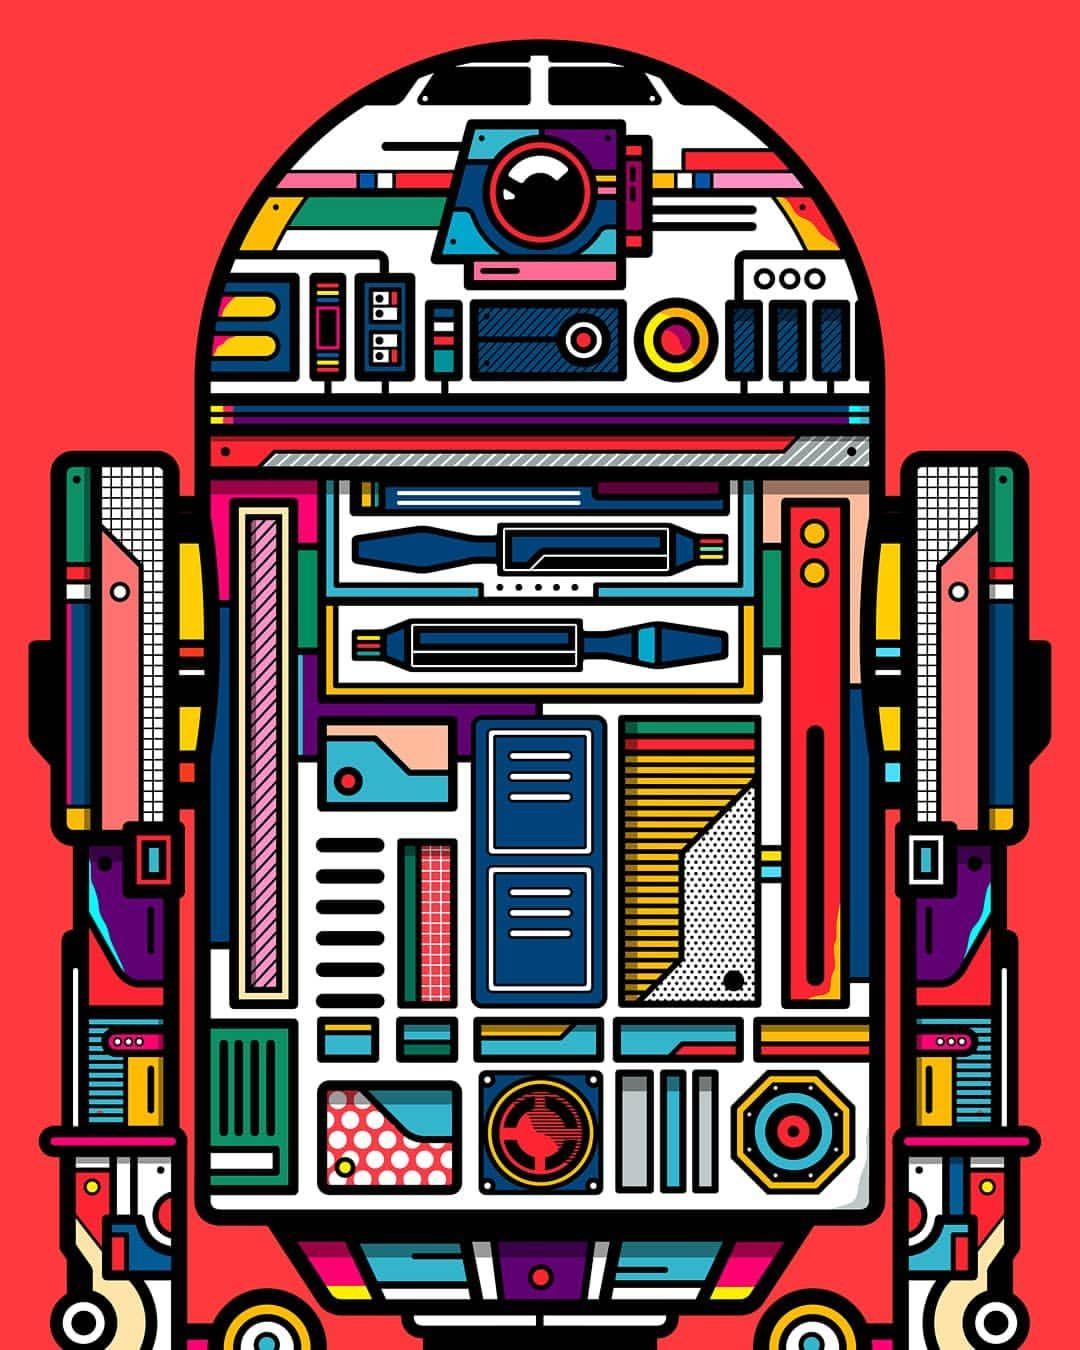 Pin by BROTHERTEDD on Star Wars Star wars bb8, Star wars